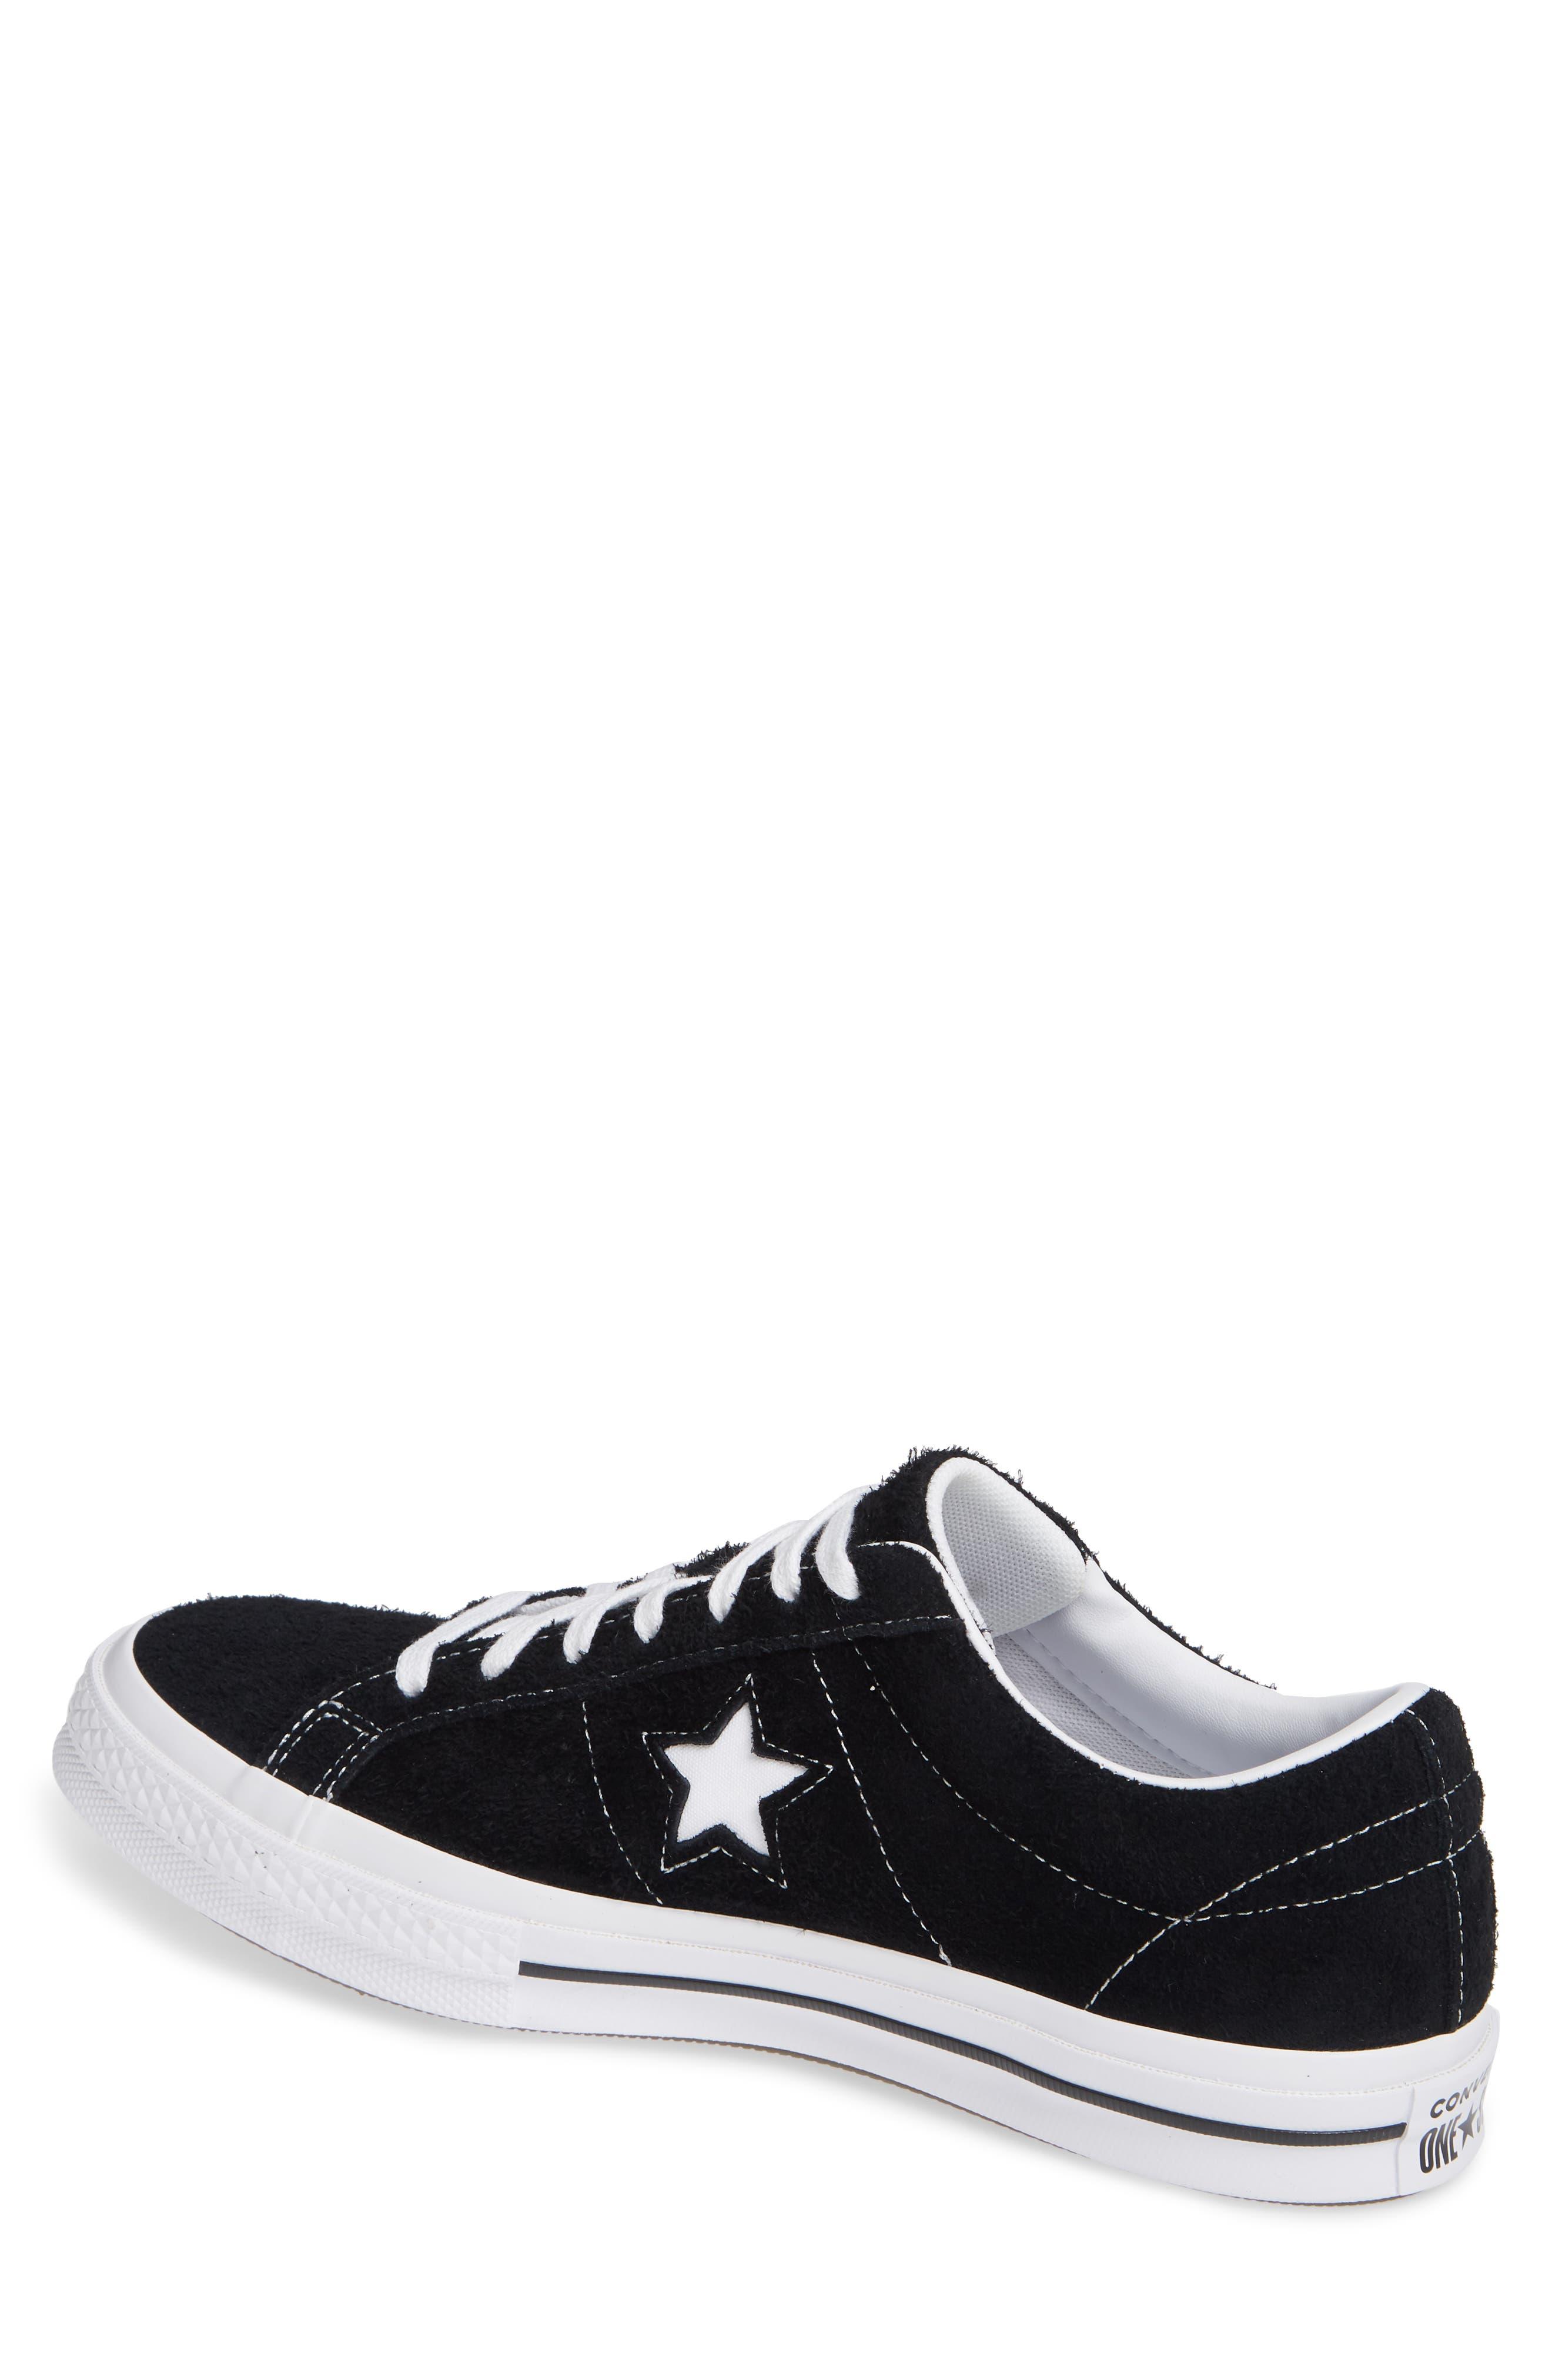 One Star Low Top Sneaker,                             Alternate thumbnail 2, color,                             MASON TEXTILE